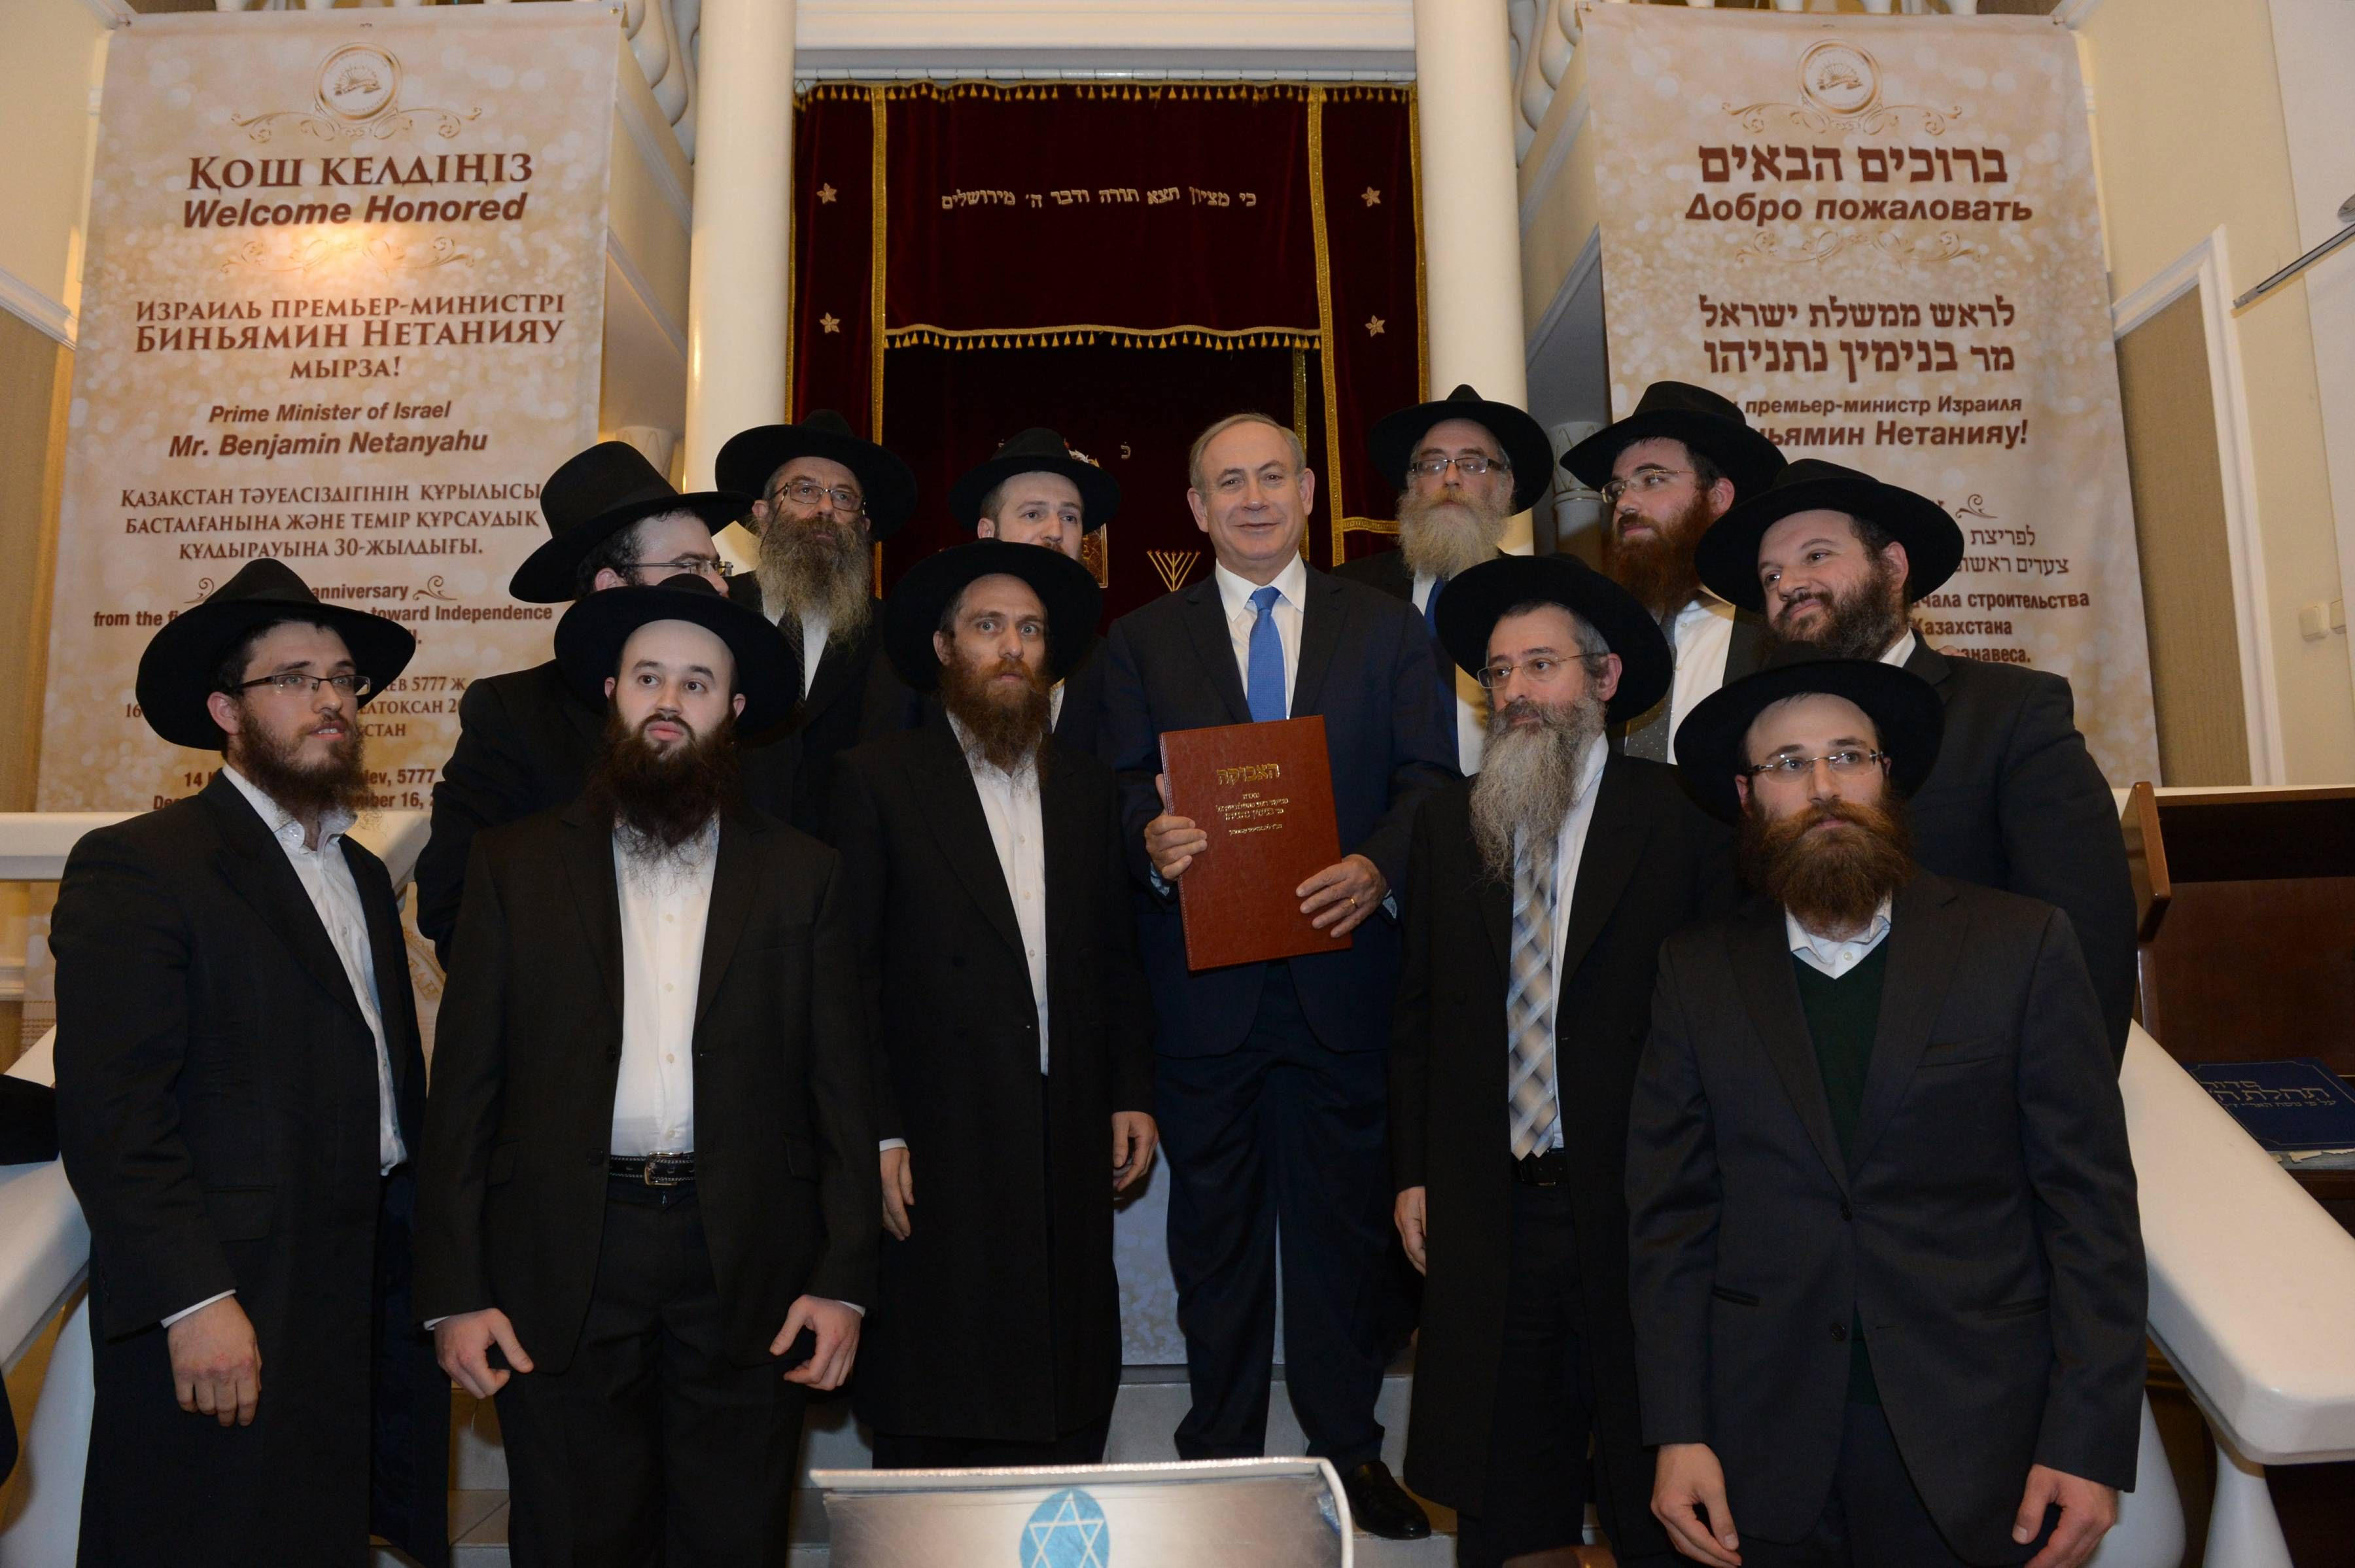 Israeli Prime Minister Benjamin Netanyahu visits the Jewish synagogue in Astana, the capital of Kazakhstan, on December 14, 2016